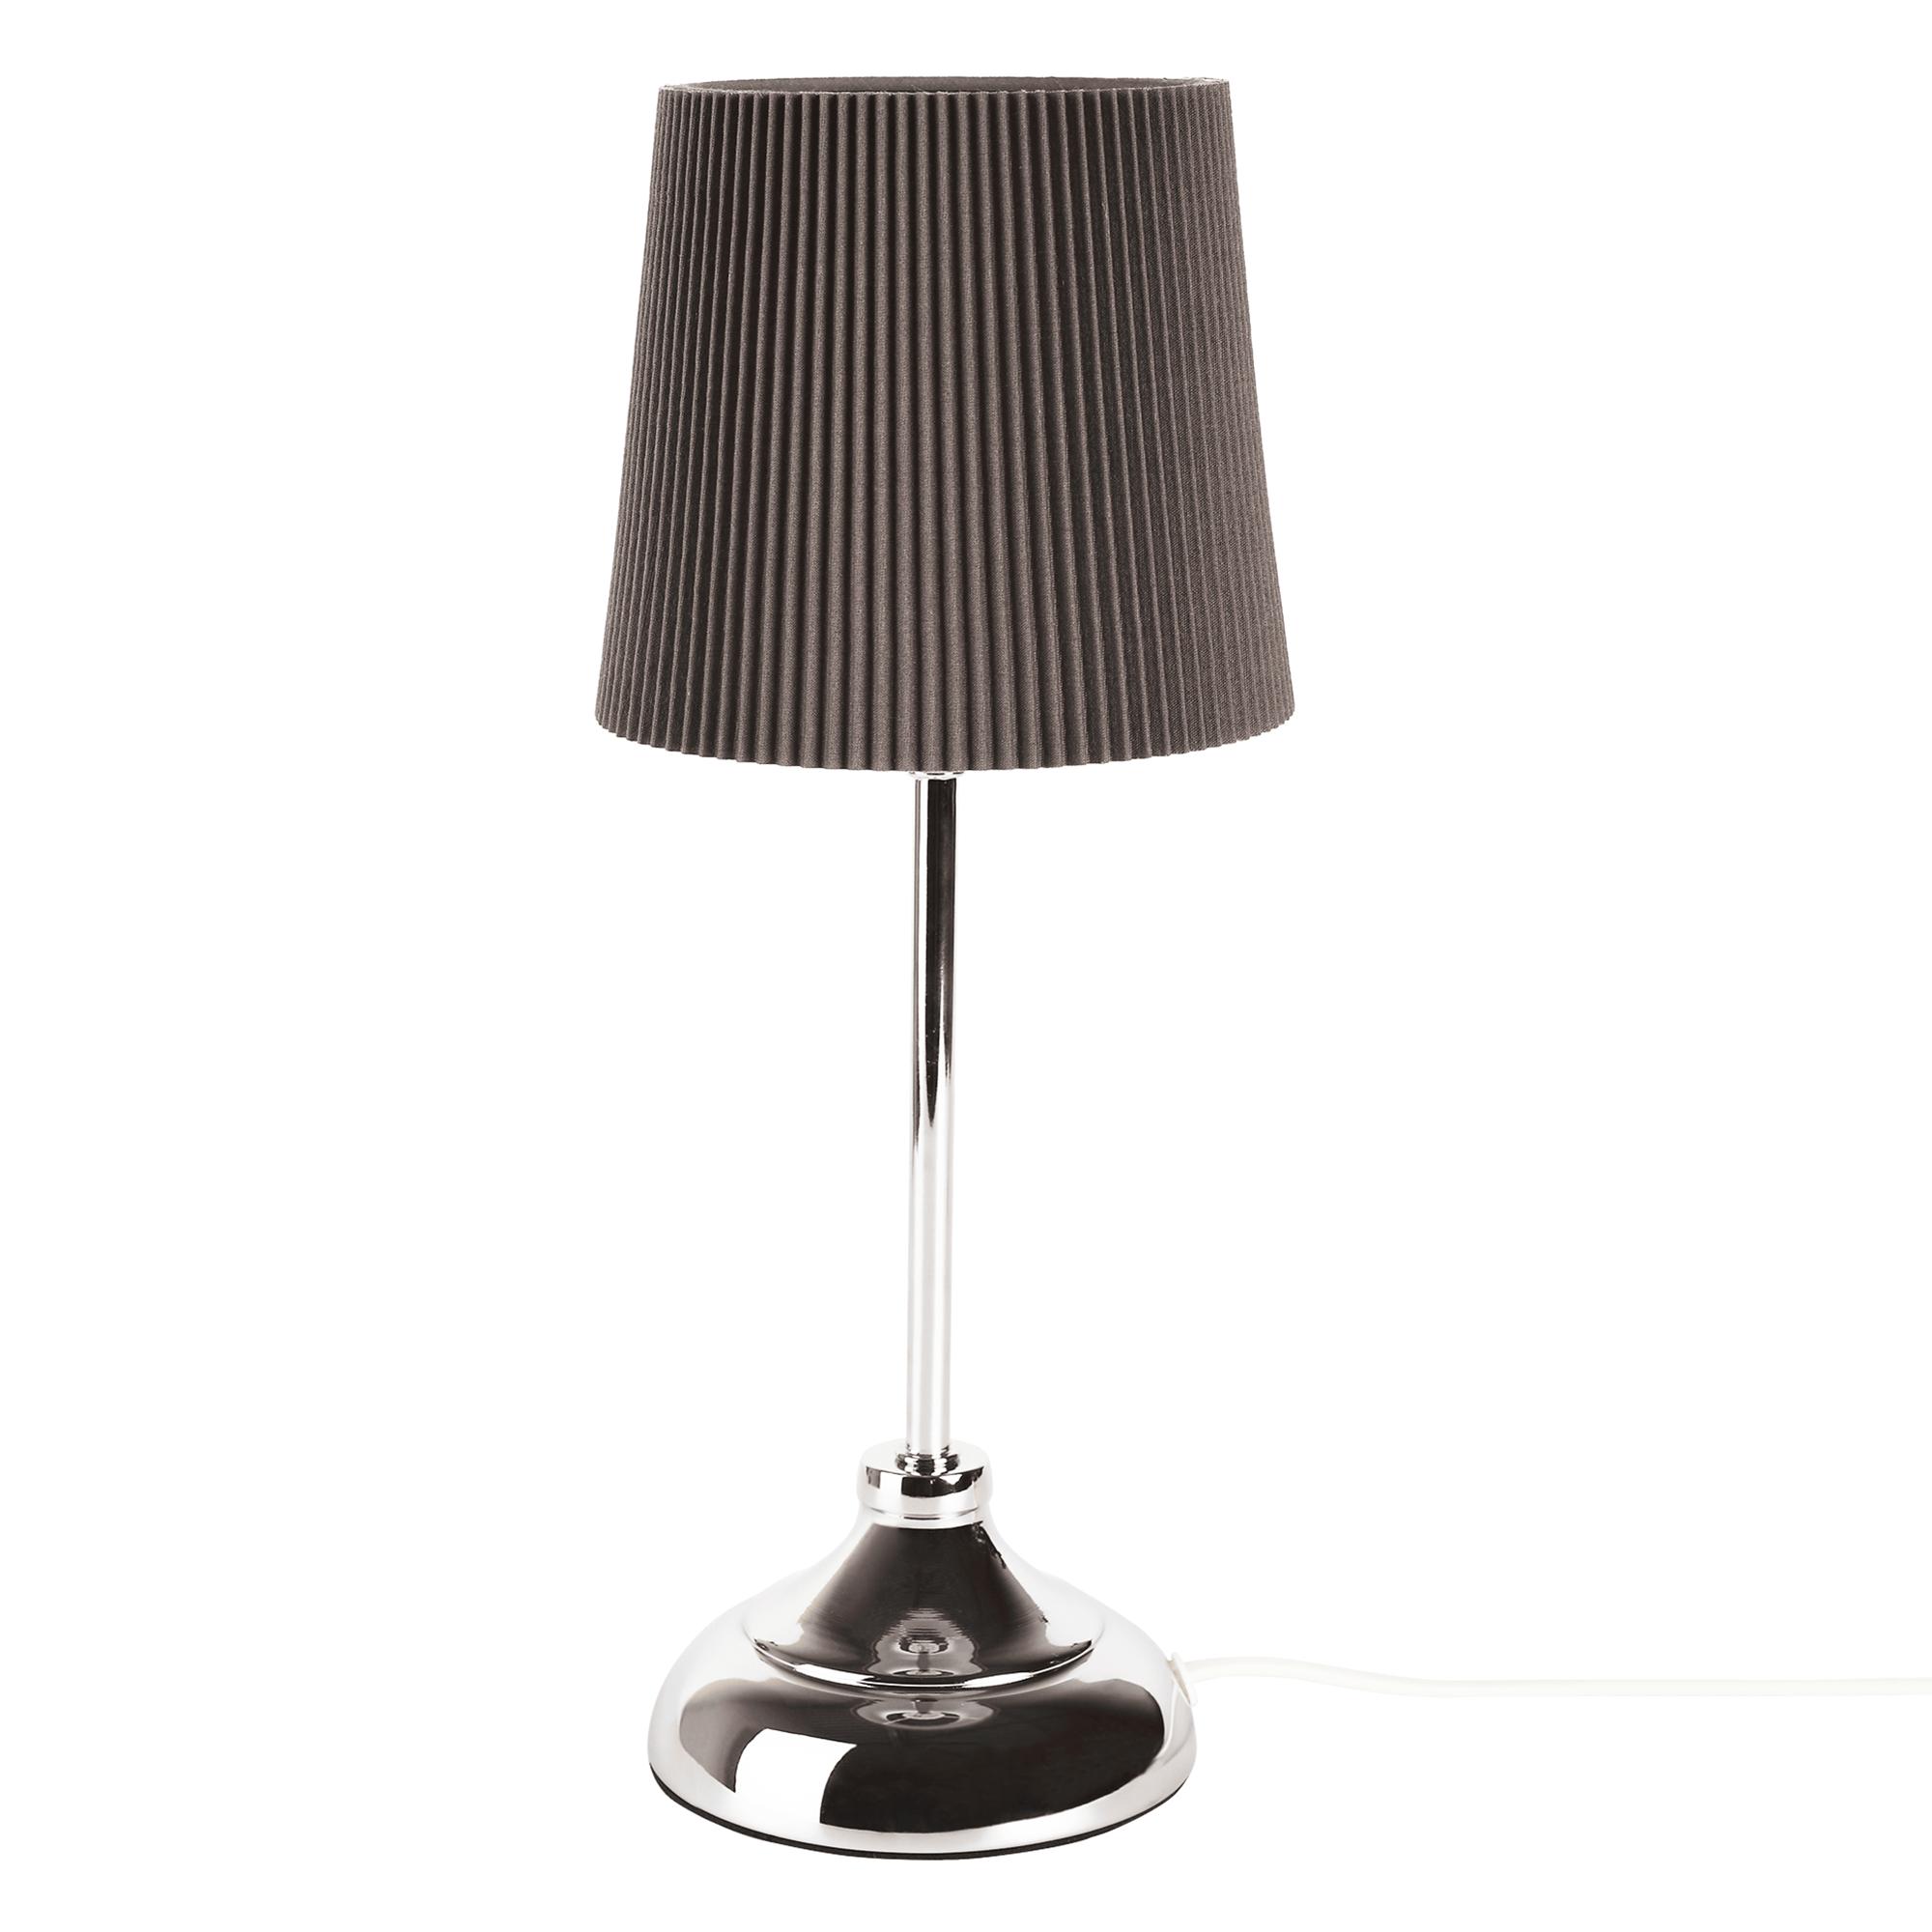 Stolná lampa, kov/sivé textilné tienidlo, GAIDEN